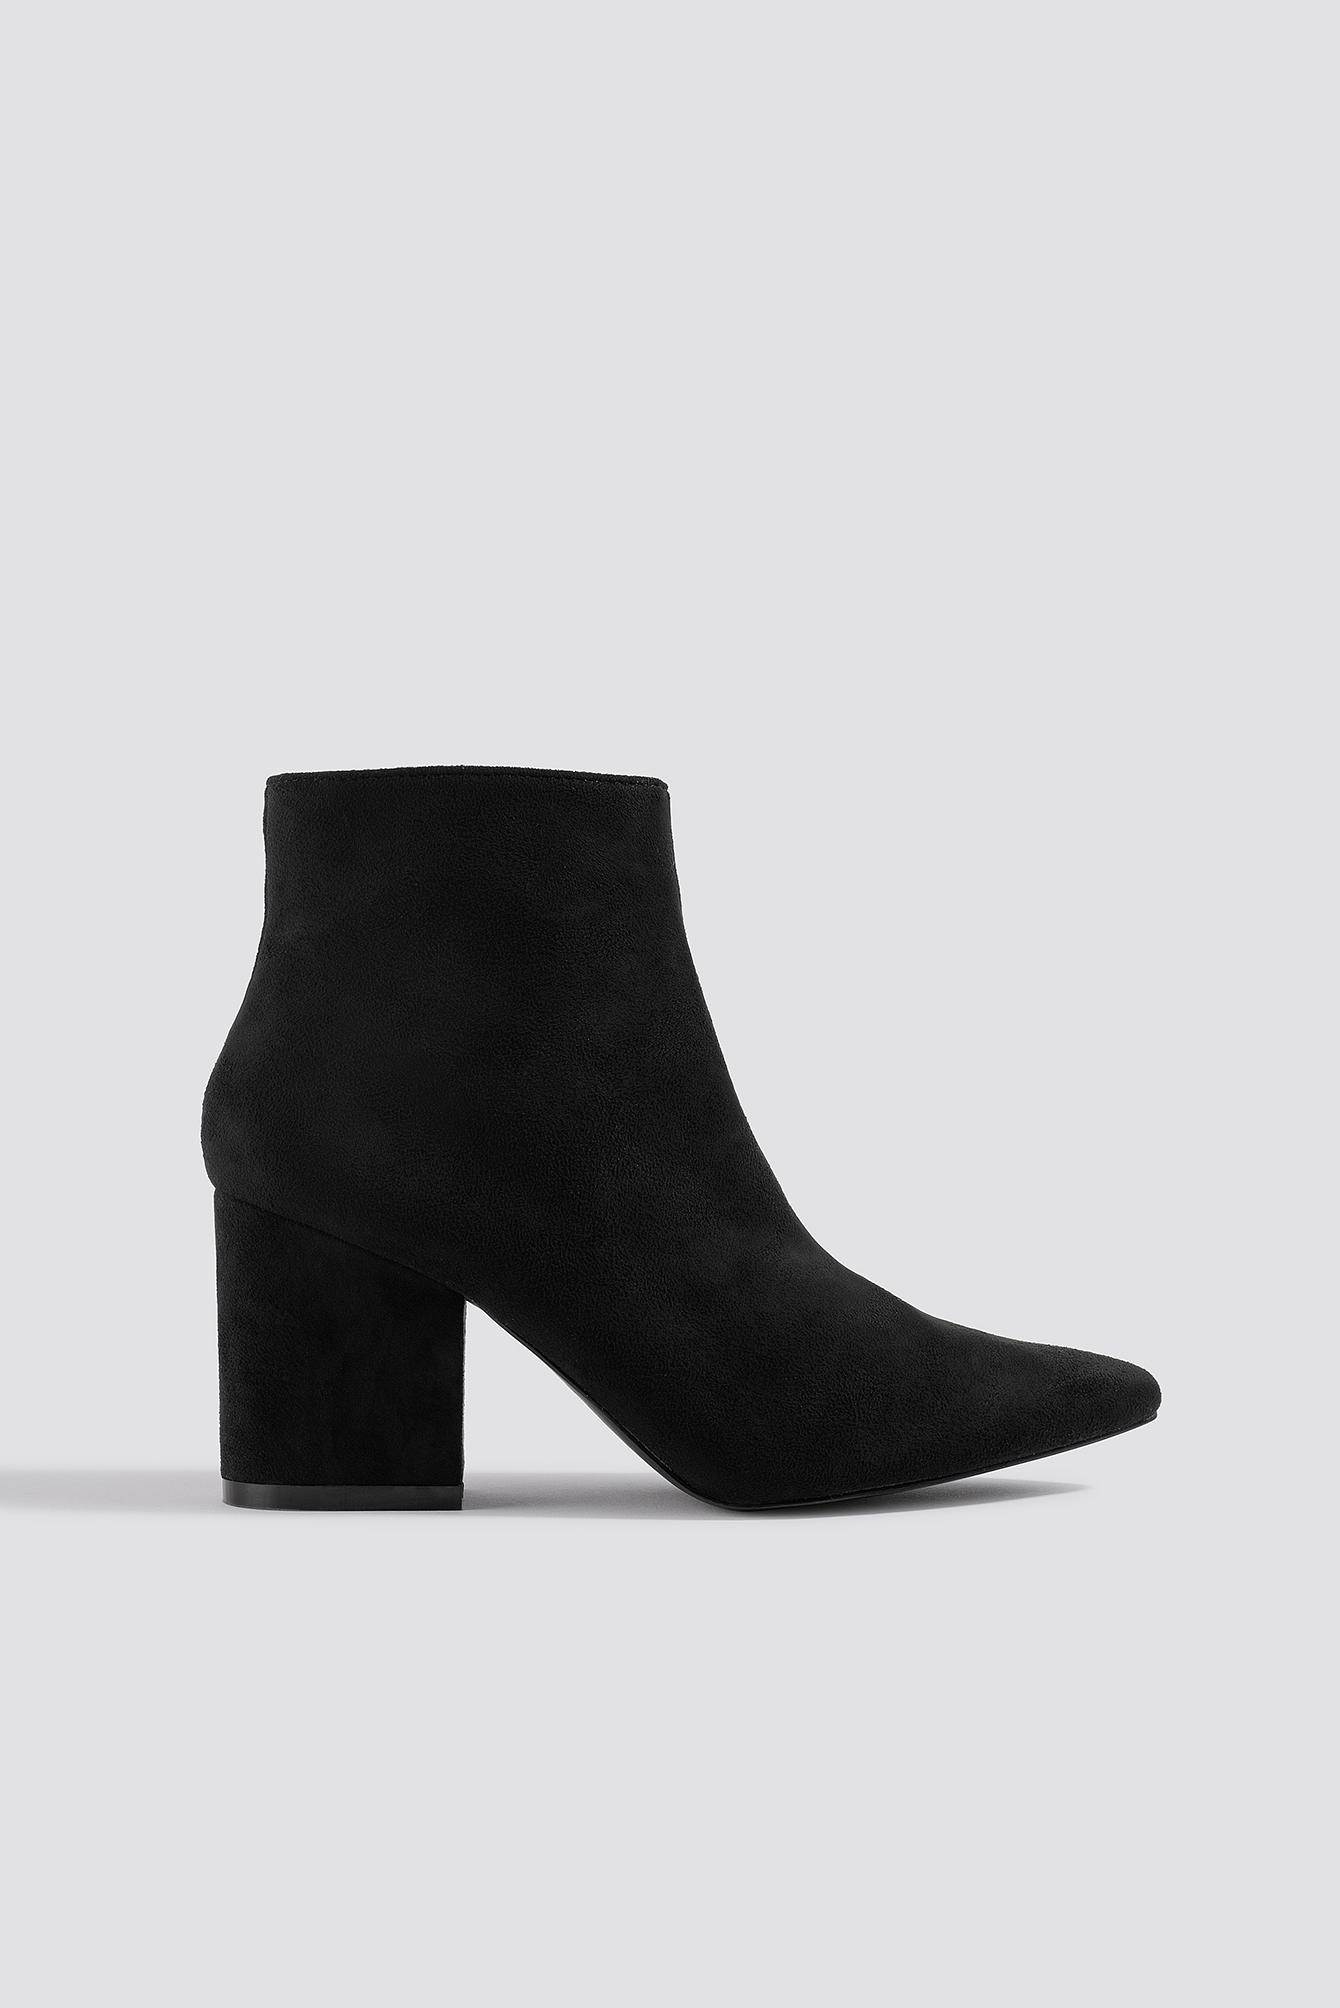 Kola Ankle Boot Black by Raid